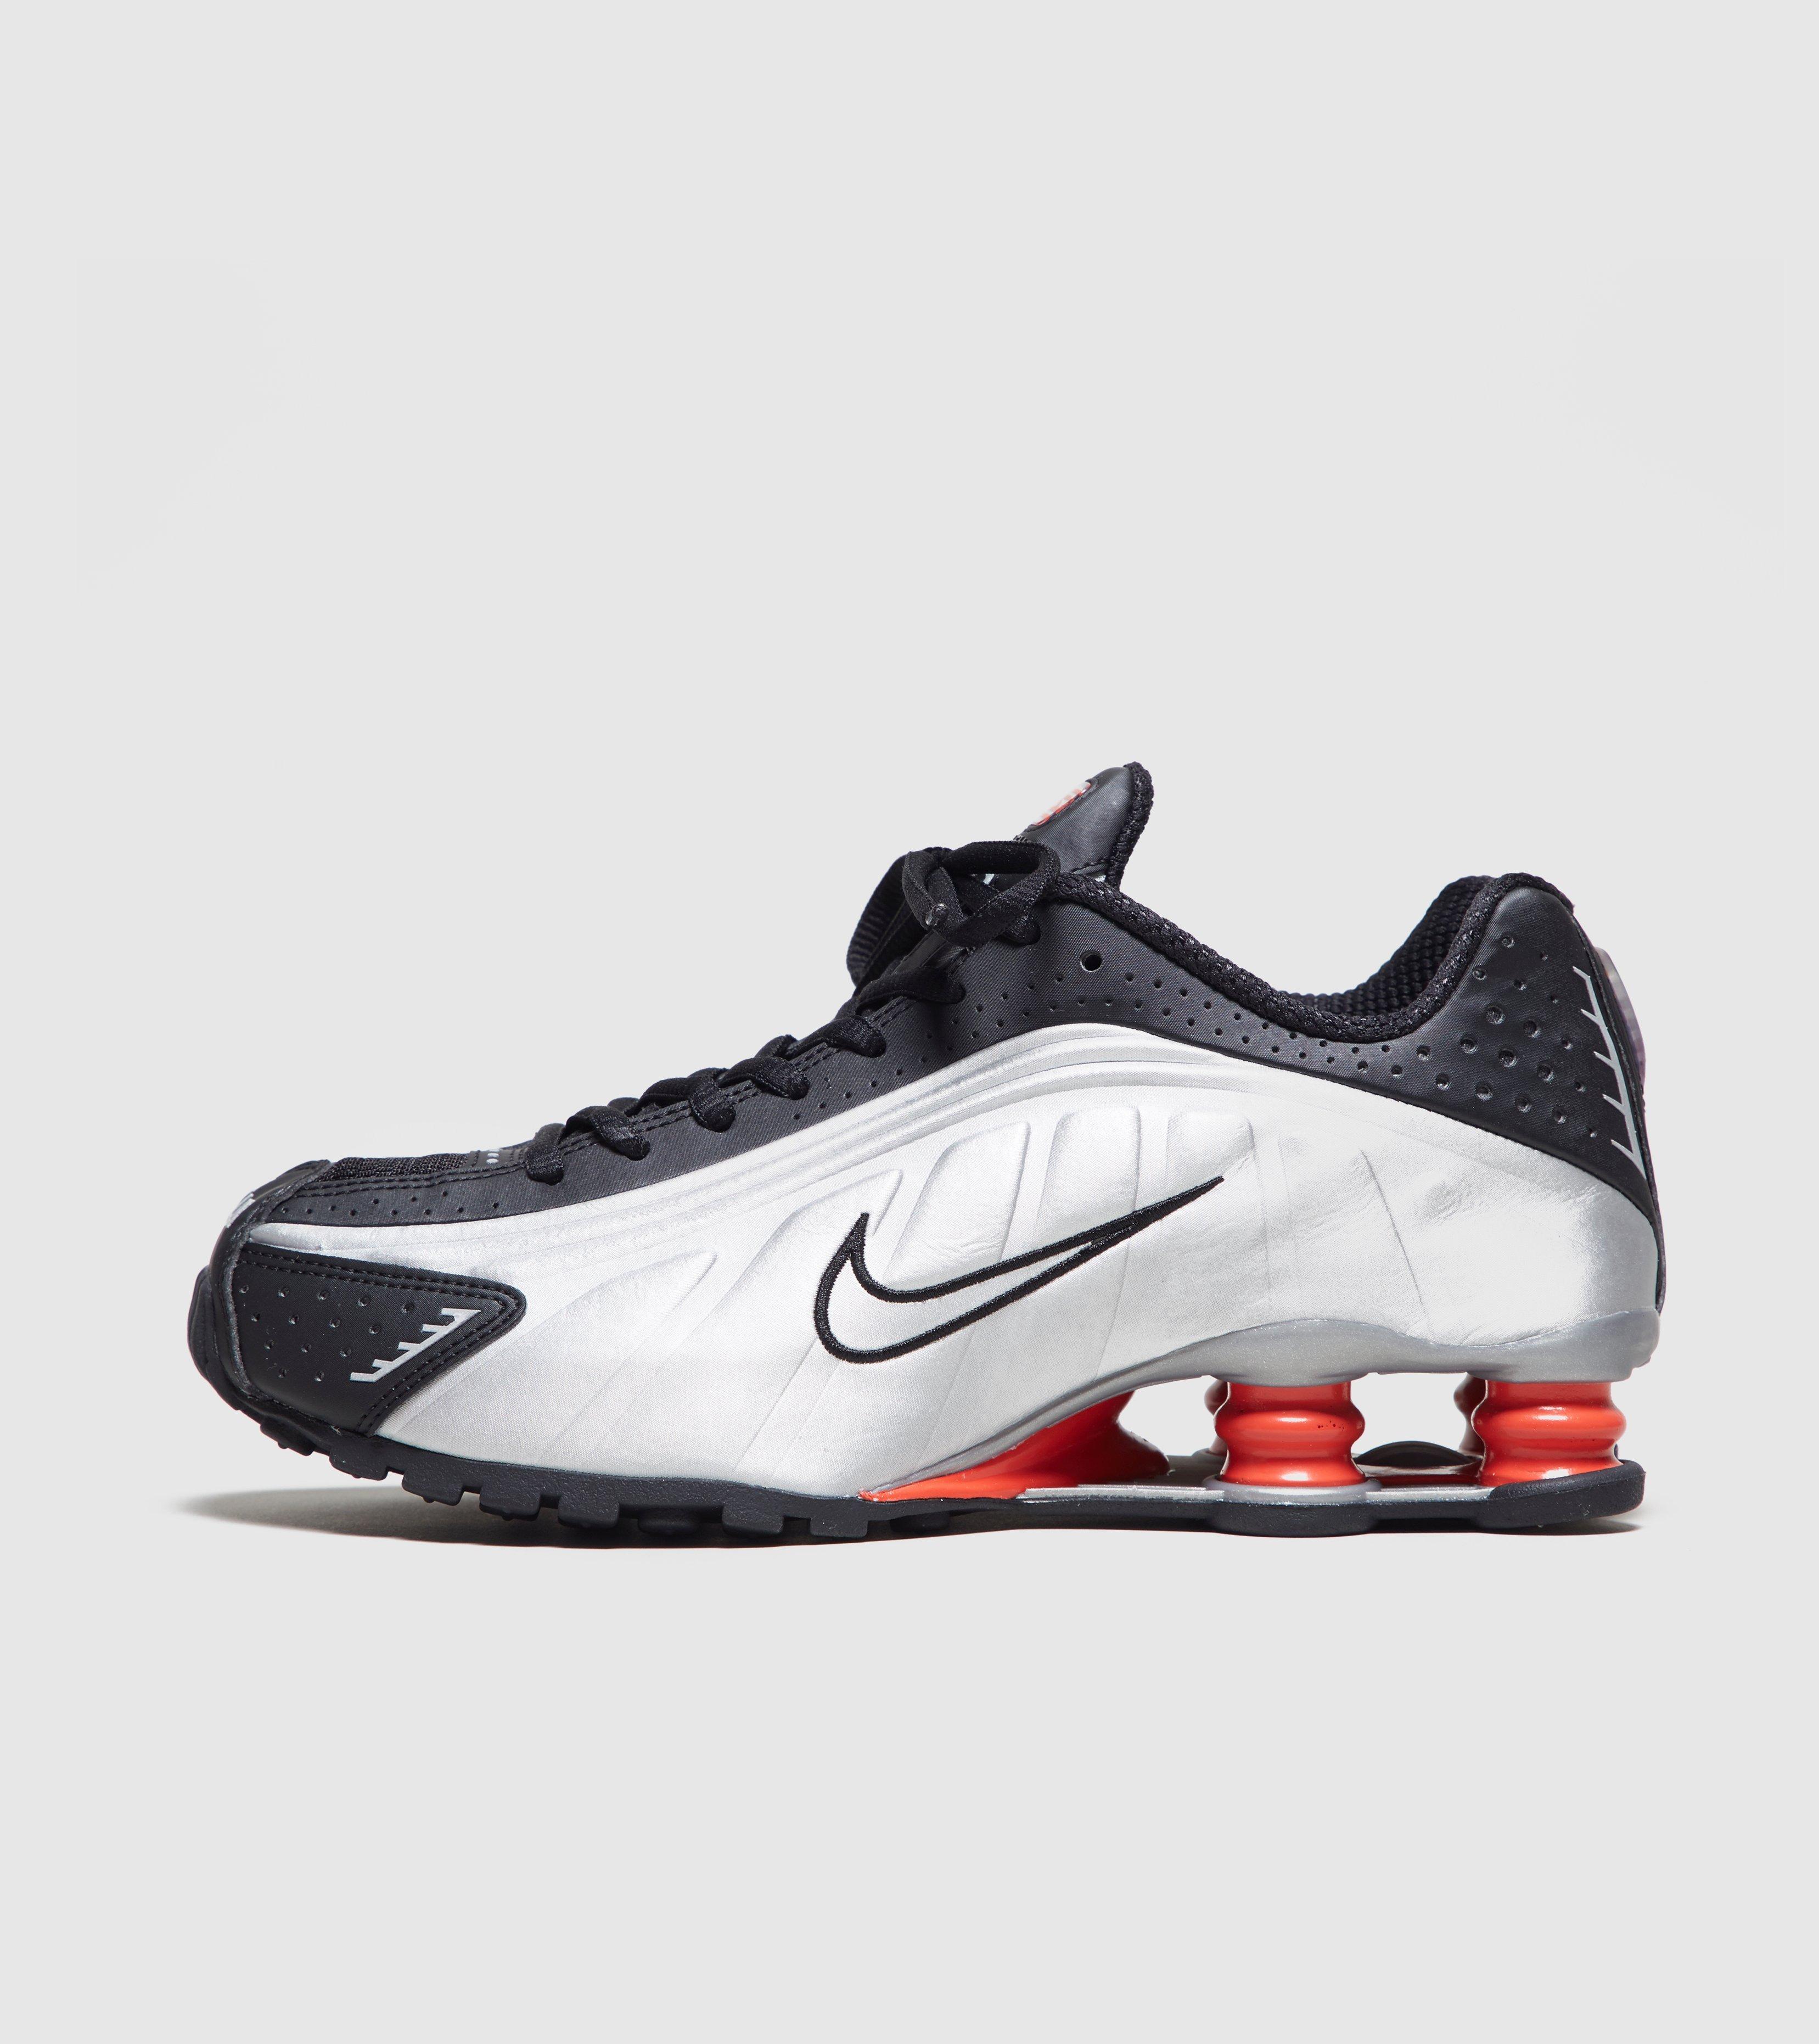 Nike Shox FrauenSize FrauenSize Shox Nike R4 R4 vNm08wn